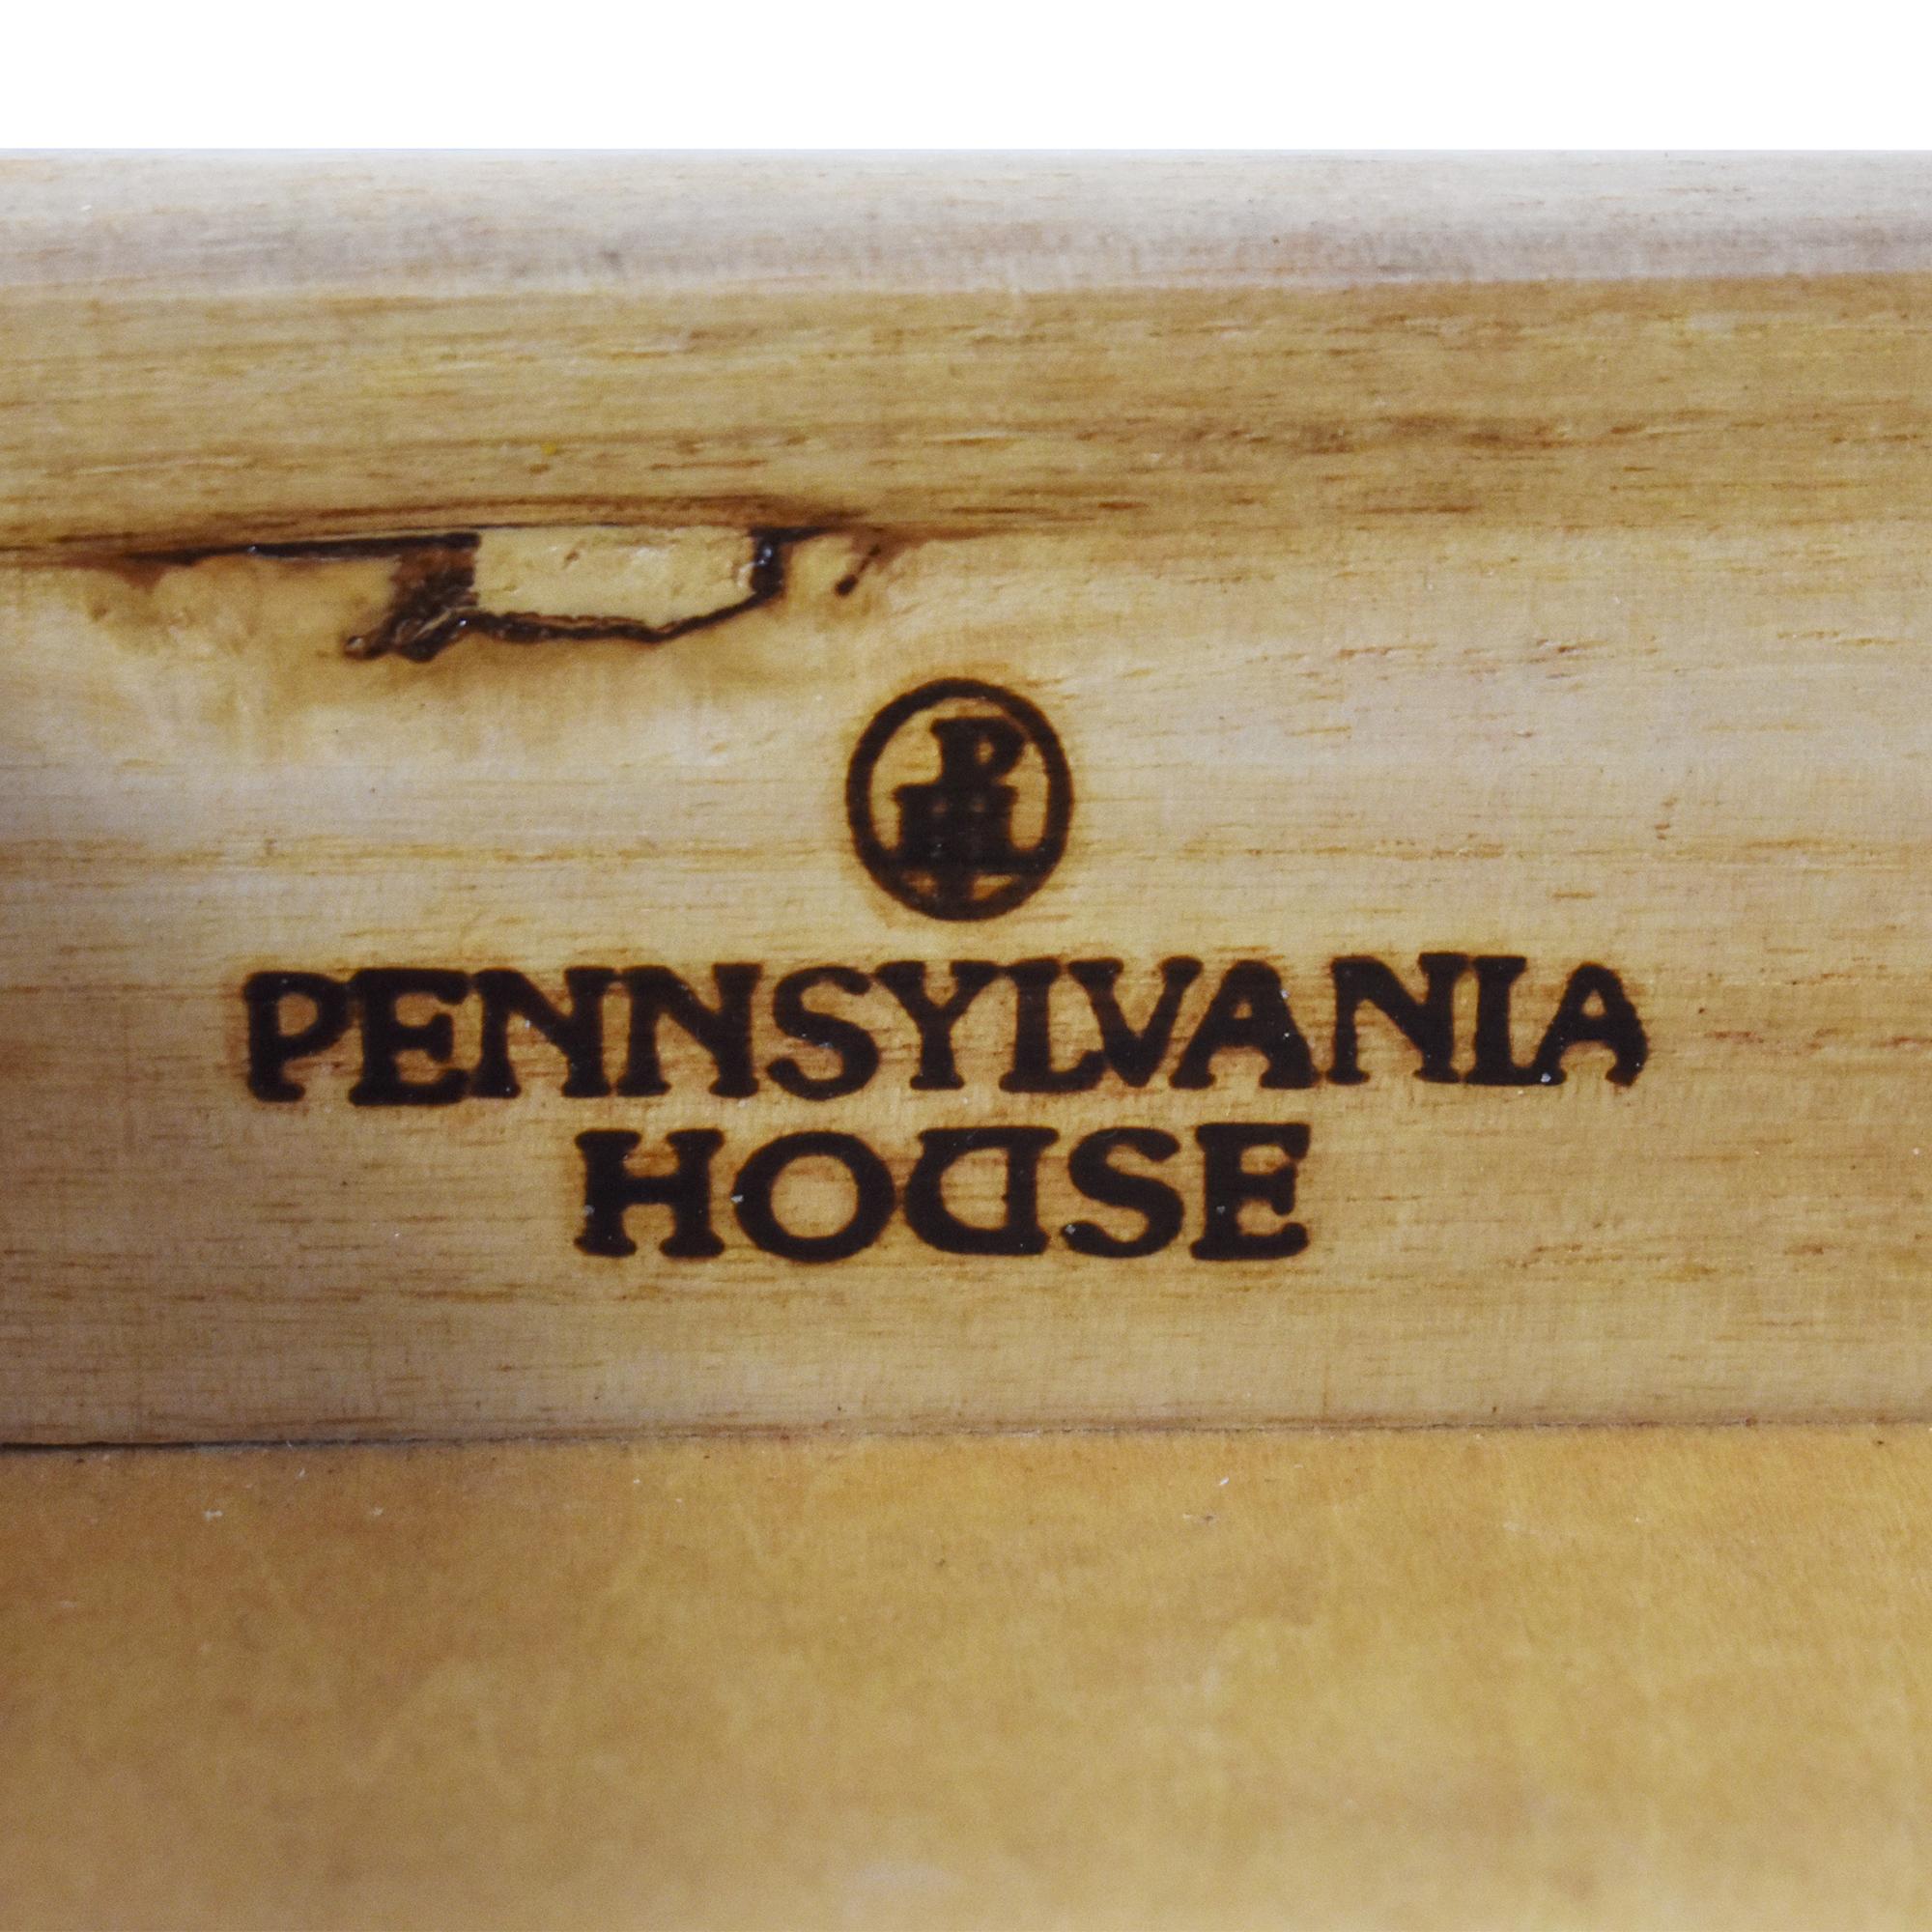 Pennsylvania House Pennsylvania House Nightstand coupon